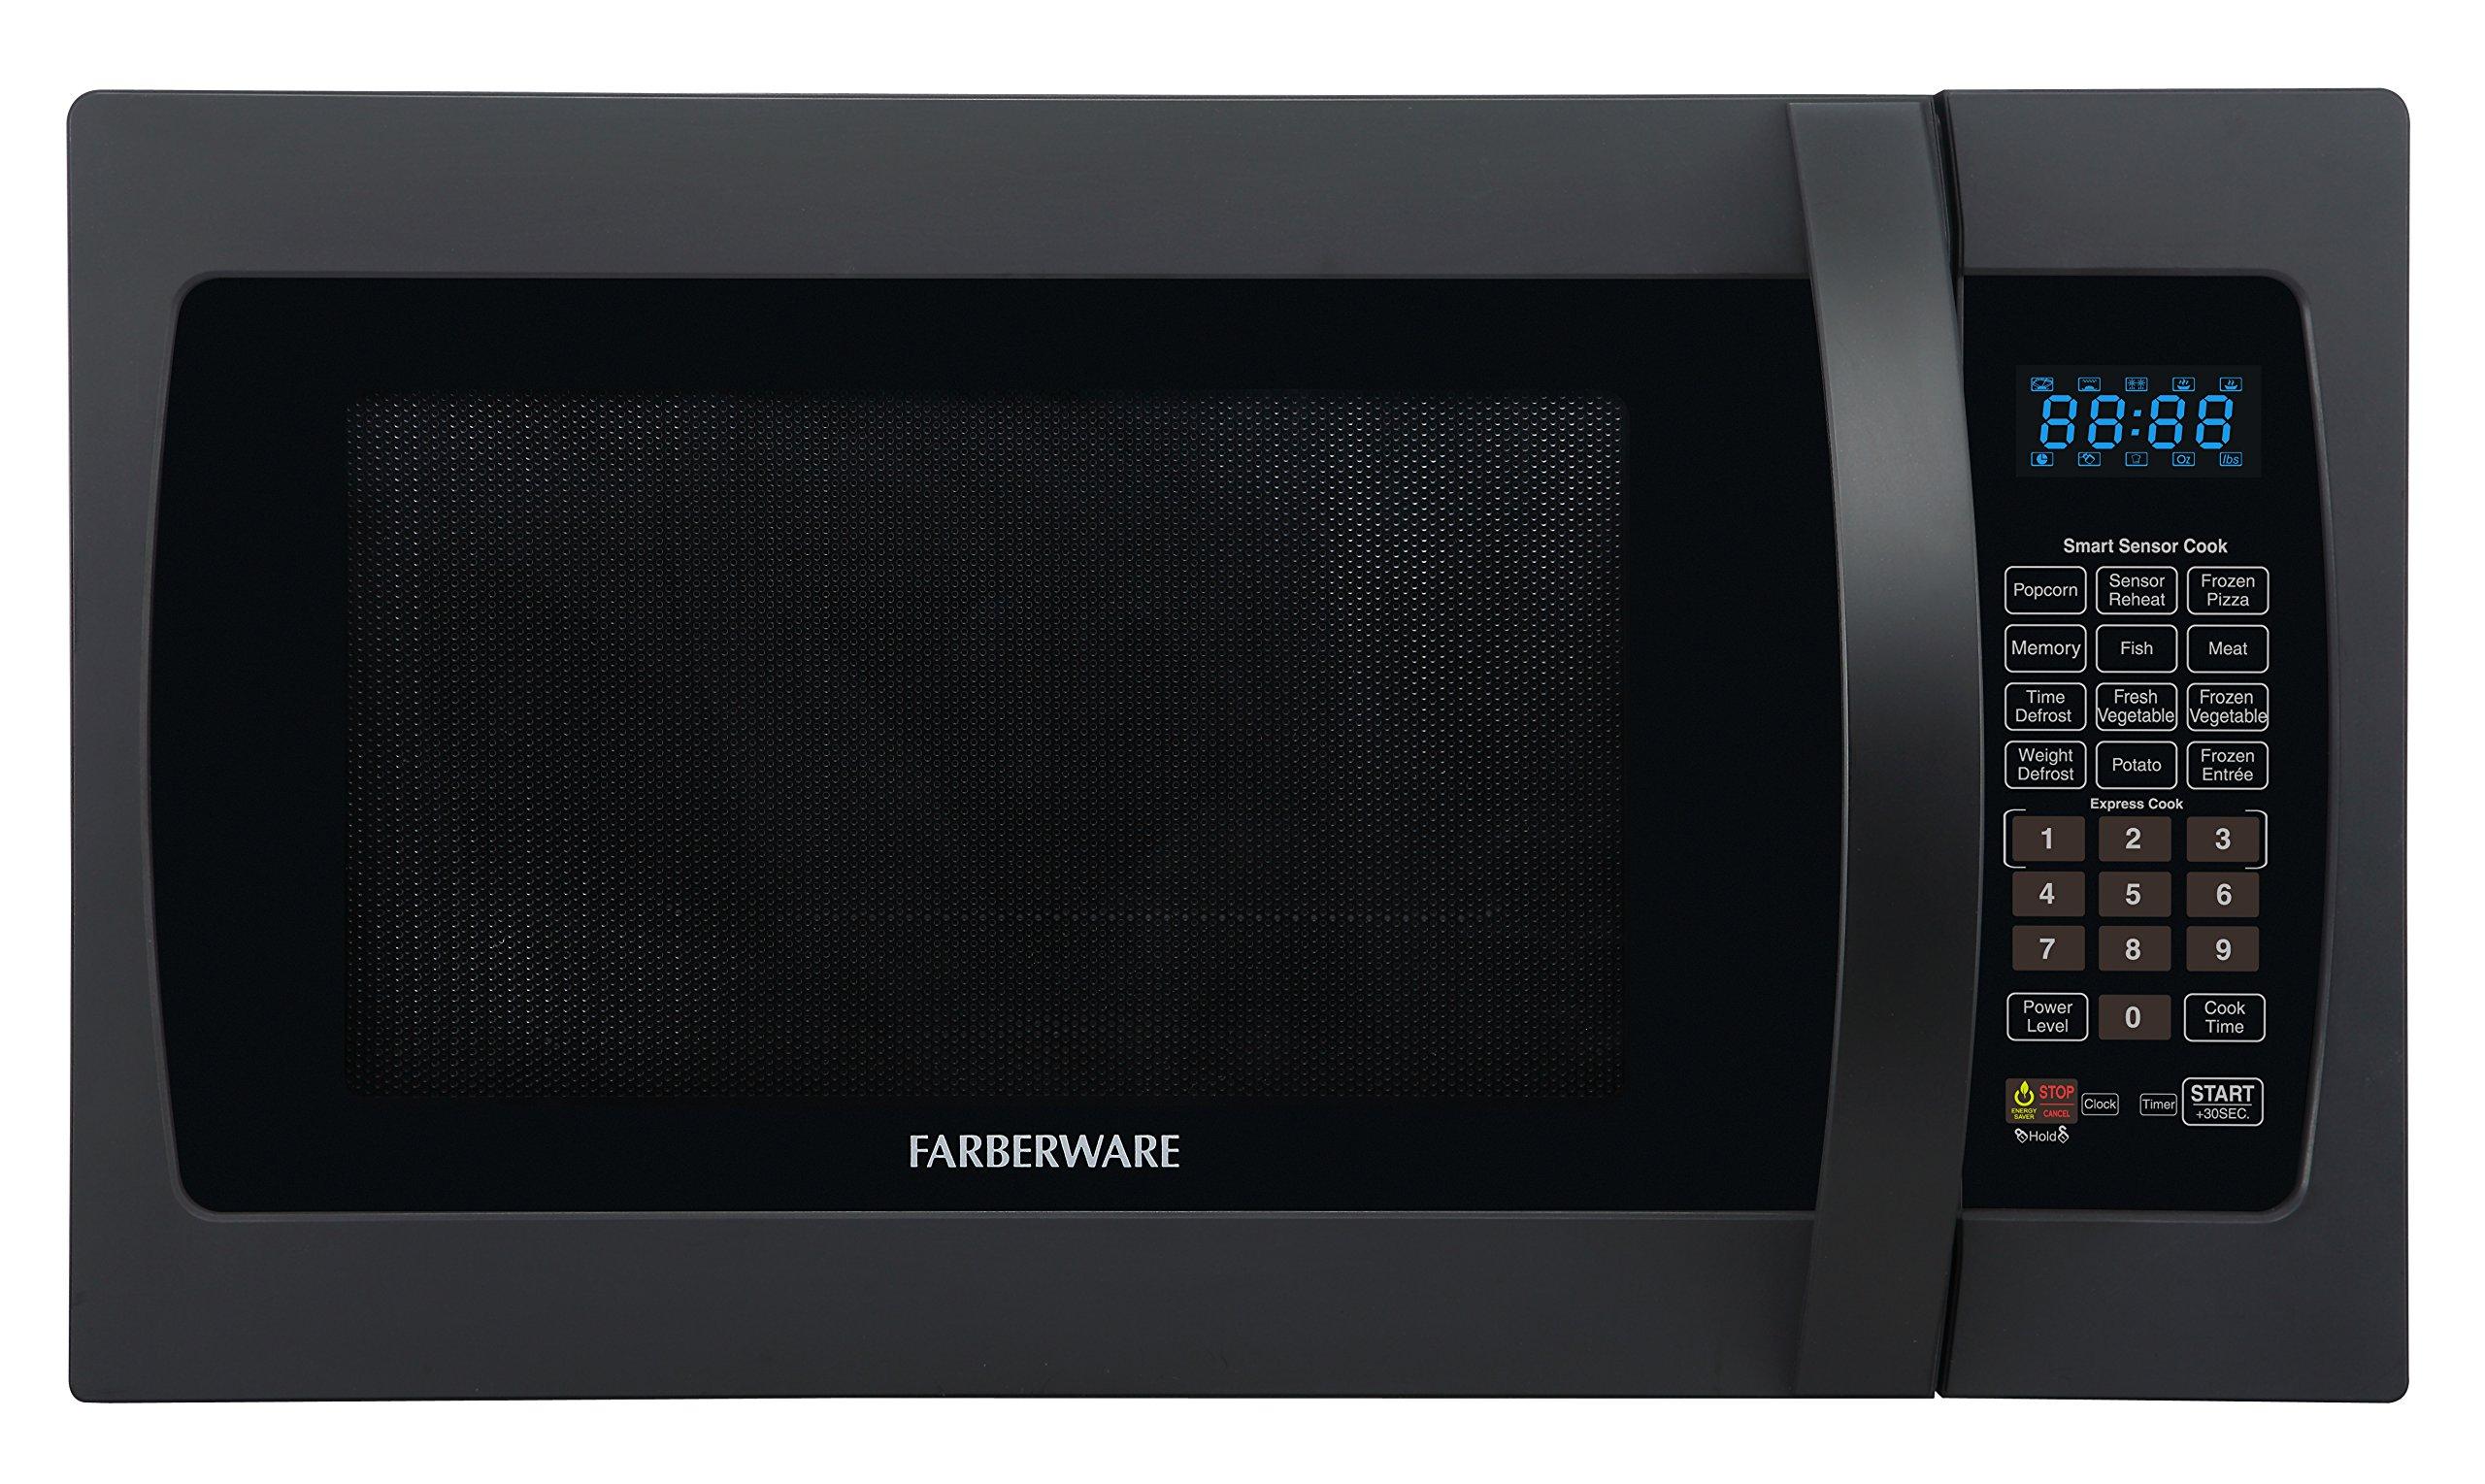 Farberware Professional FMO13AHTBKF 1.3 Cubic Foot 1100-Watt Microwave Oven with Sensor Cooking, Matte Black by Farberware